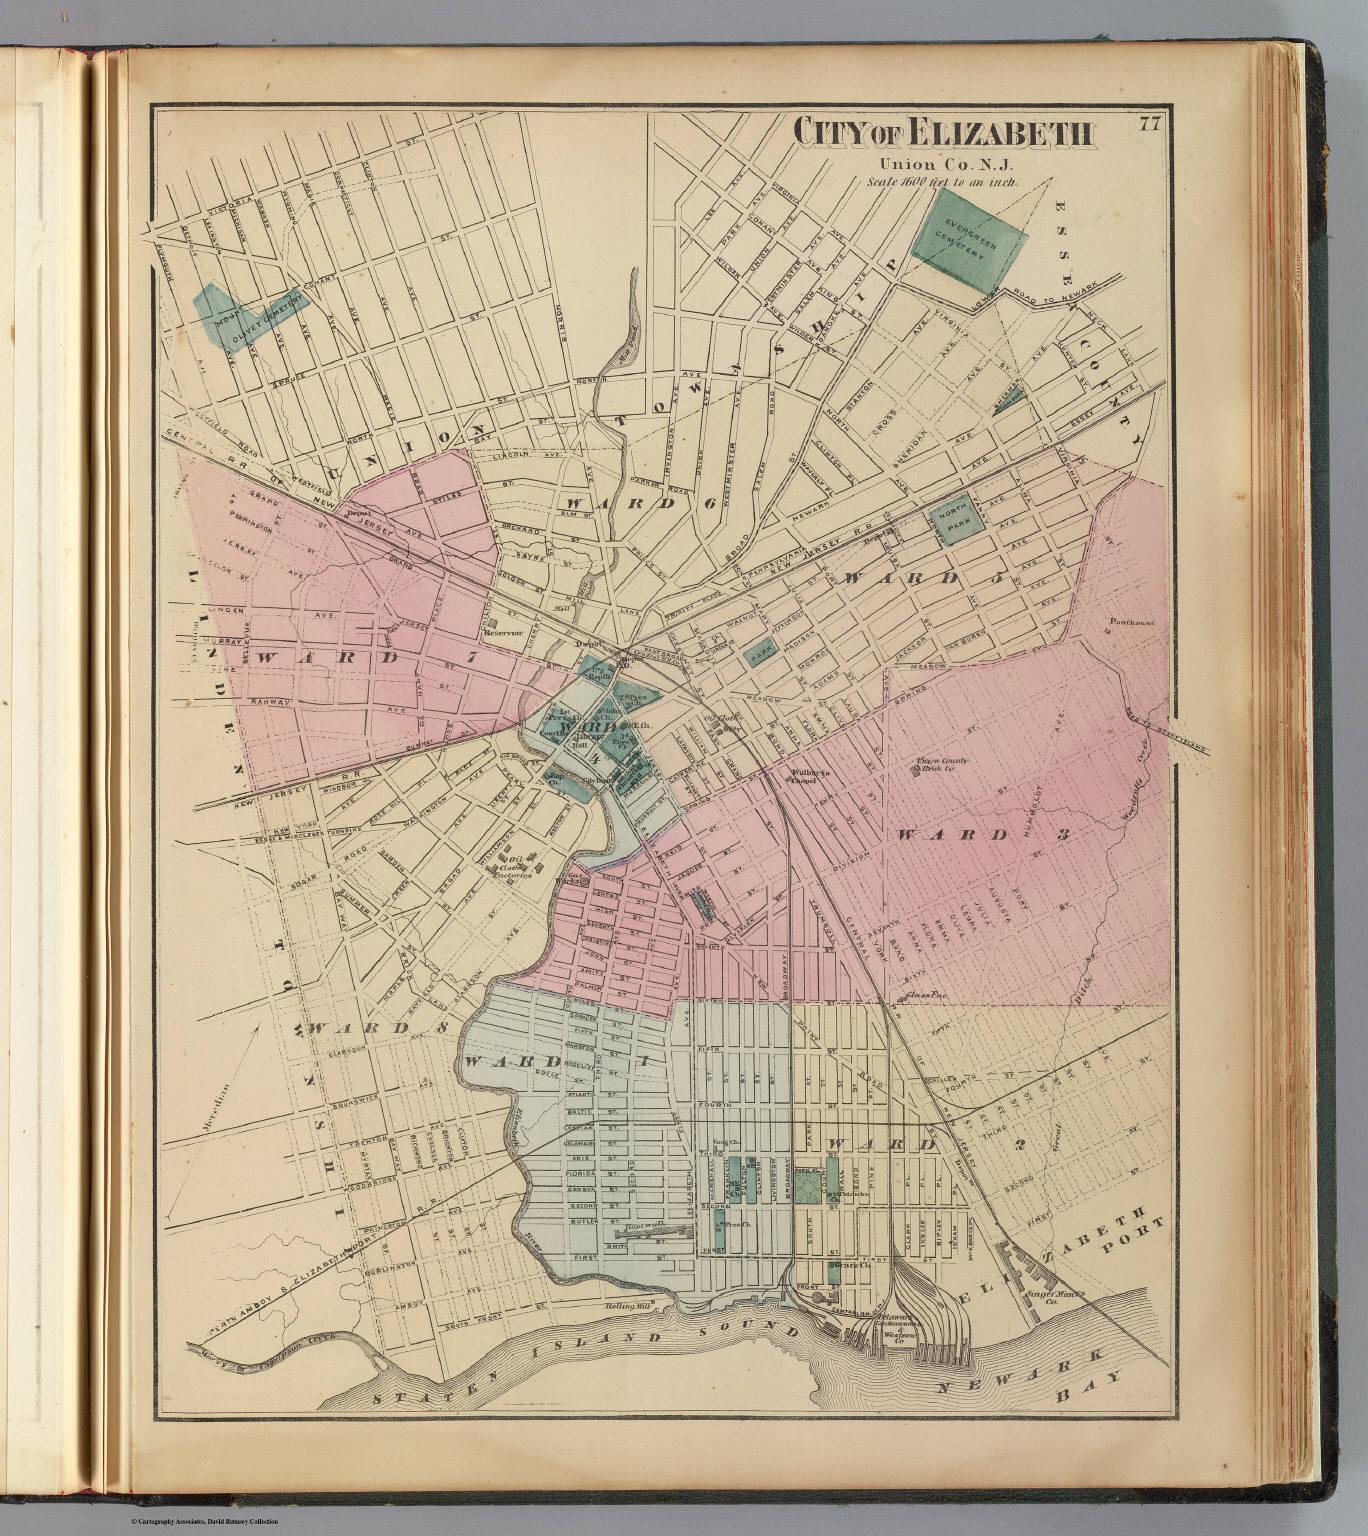 Elizabeth NJ David Rumsey Historical Map Collection